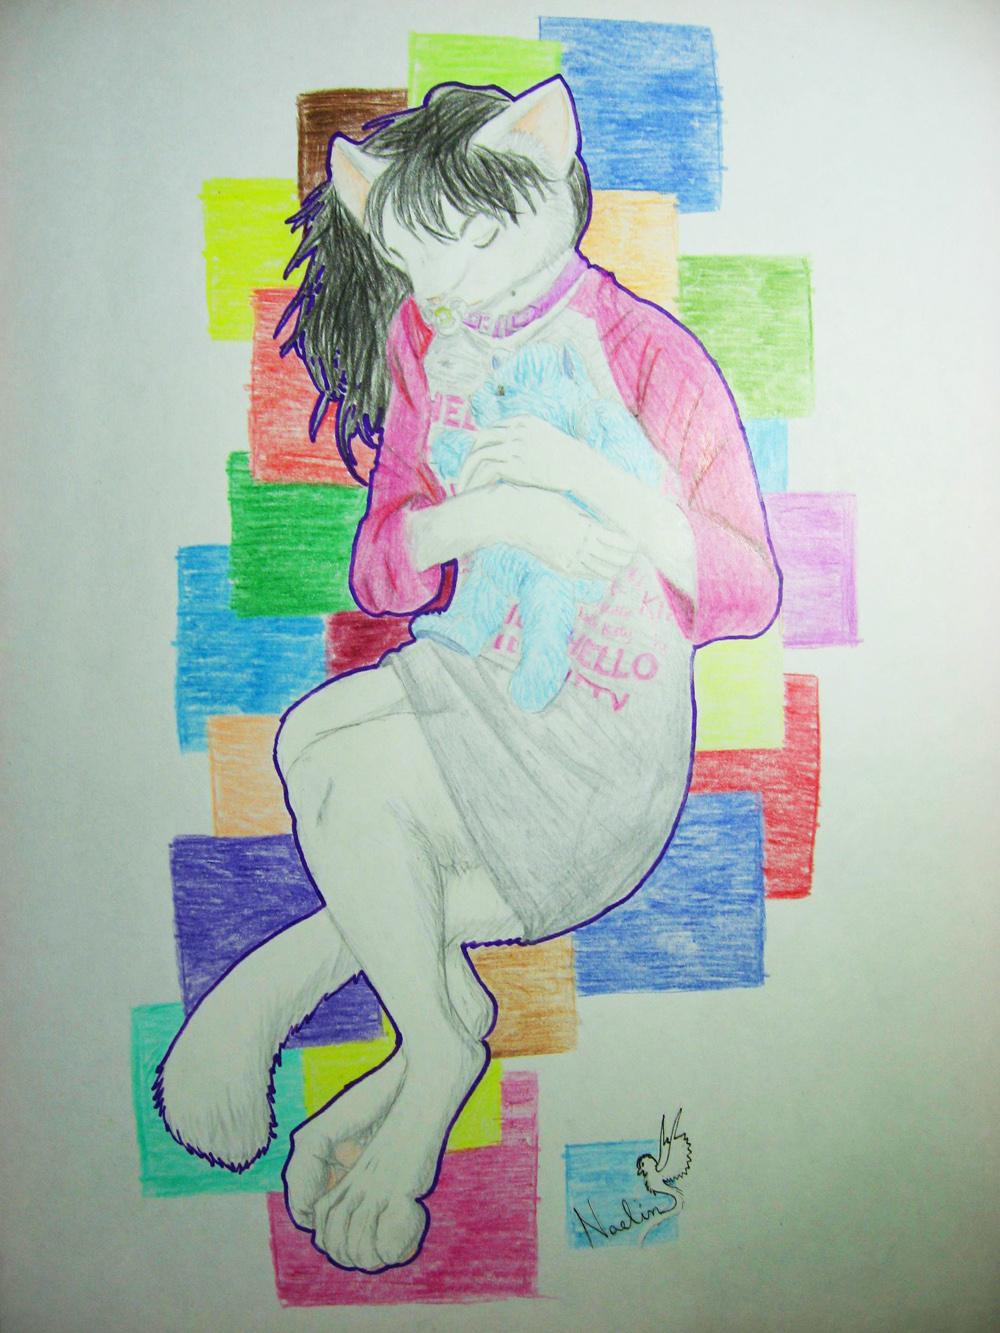 Birujito #1